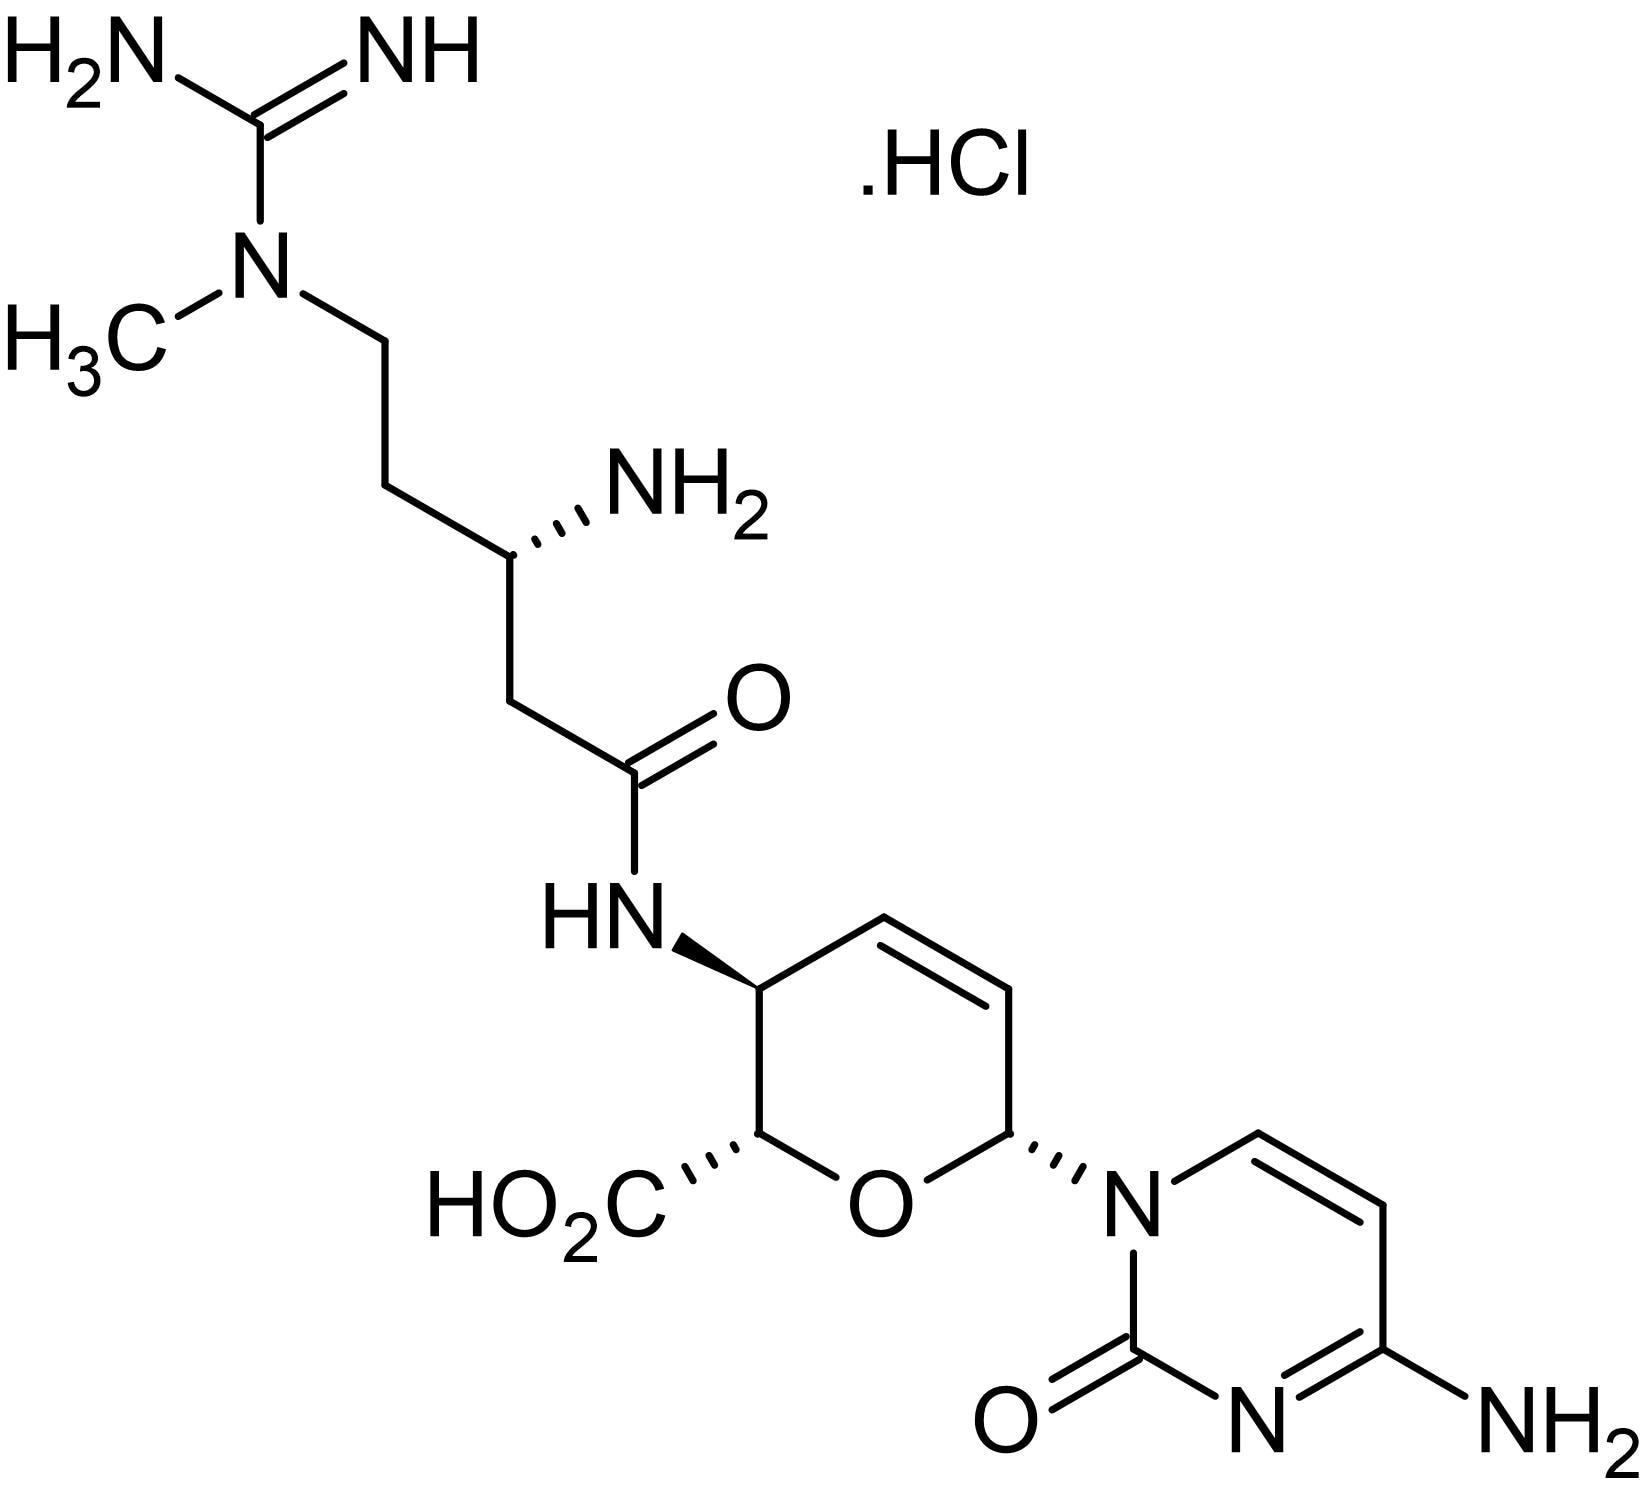 Chemical Structure - Blasticidin S hydrochloride, Nucleoside antibiotic (ab141452)